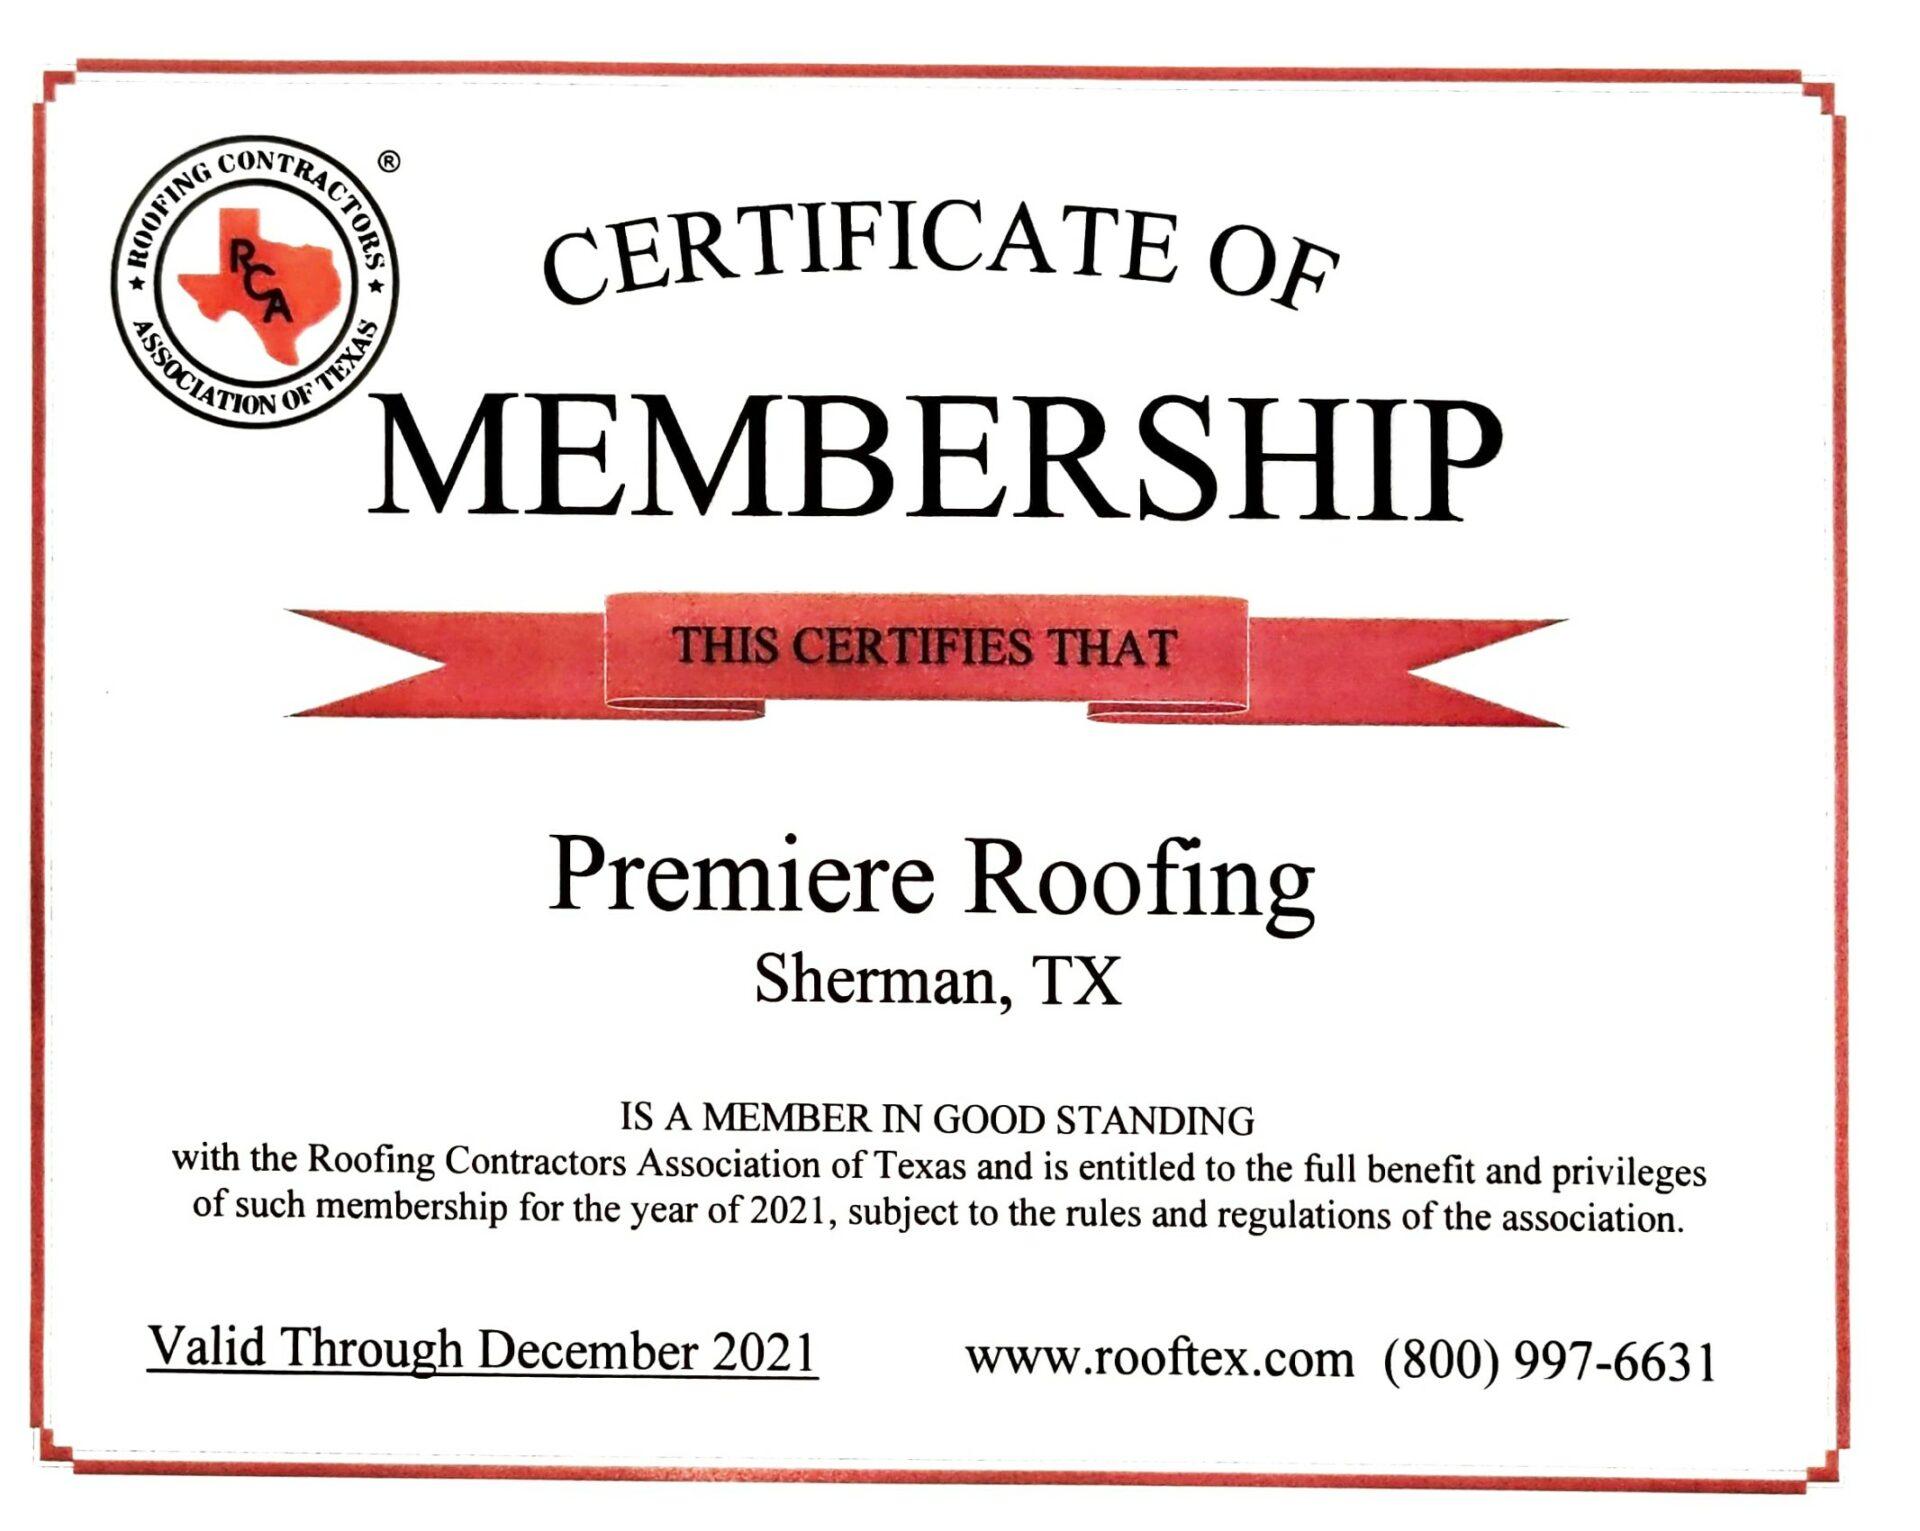 RCA Certificate of Membership Premiere Roofing